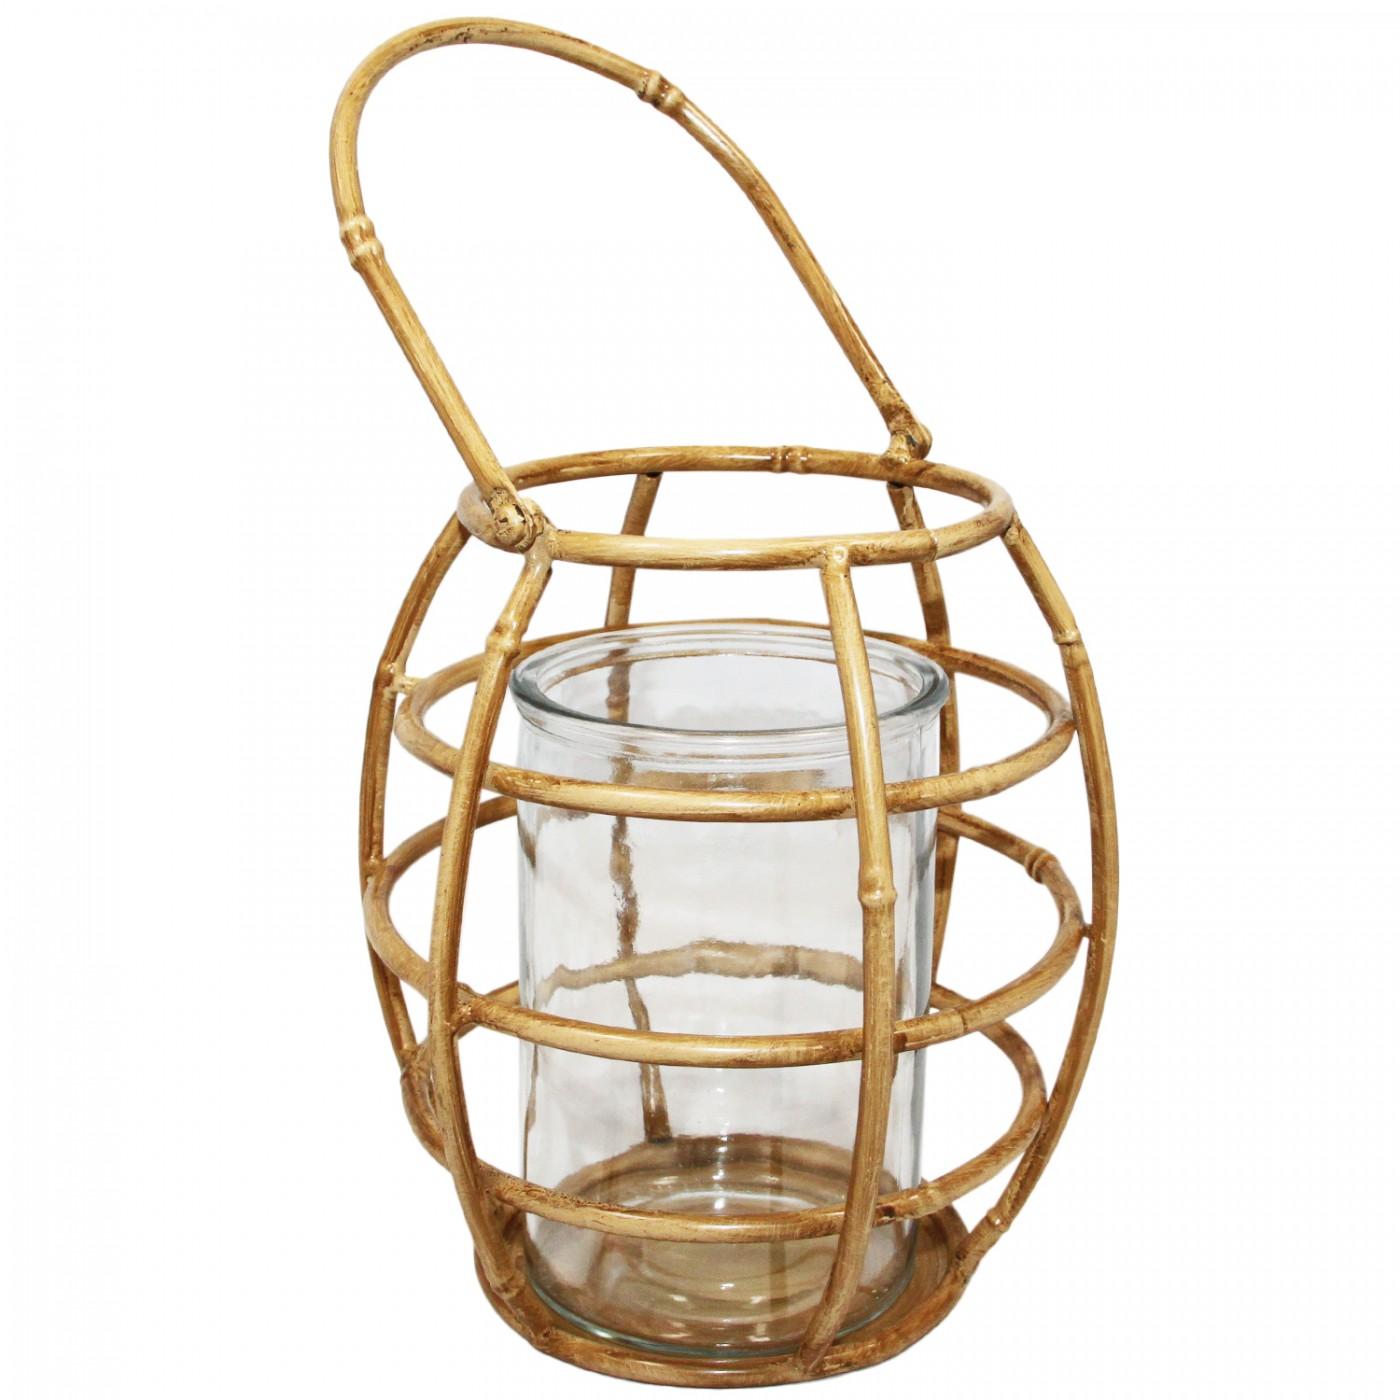 Lampion latarenka metalowa boho bambus - uchwyt